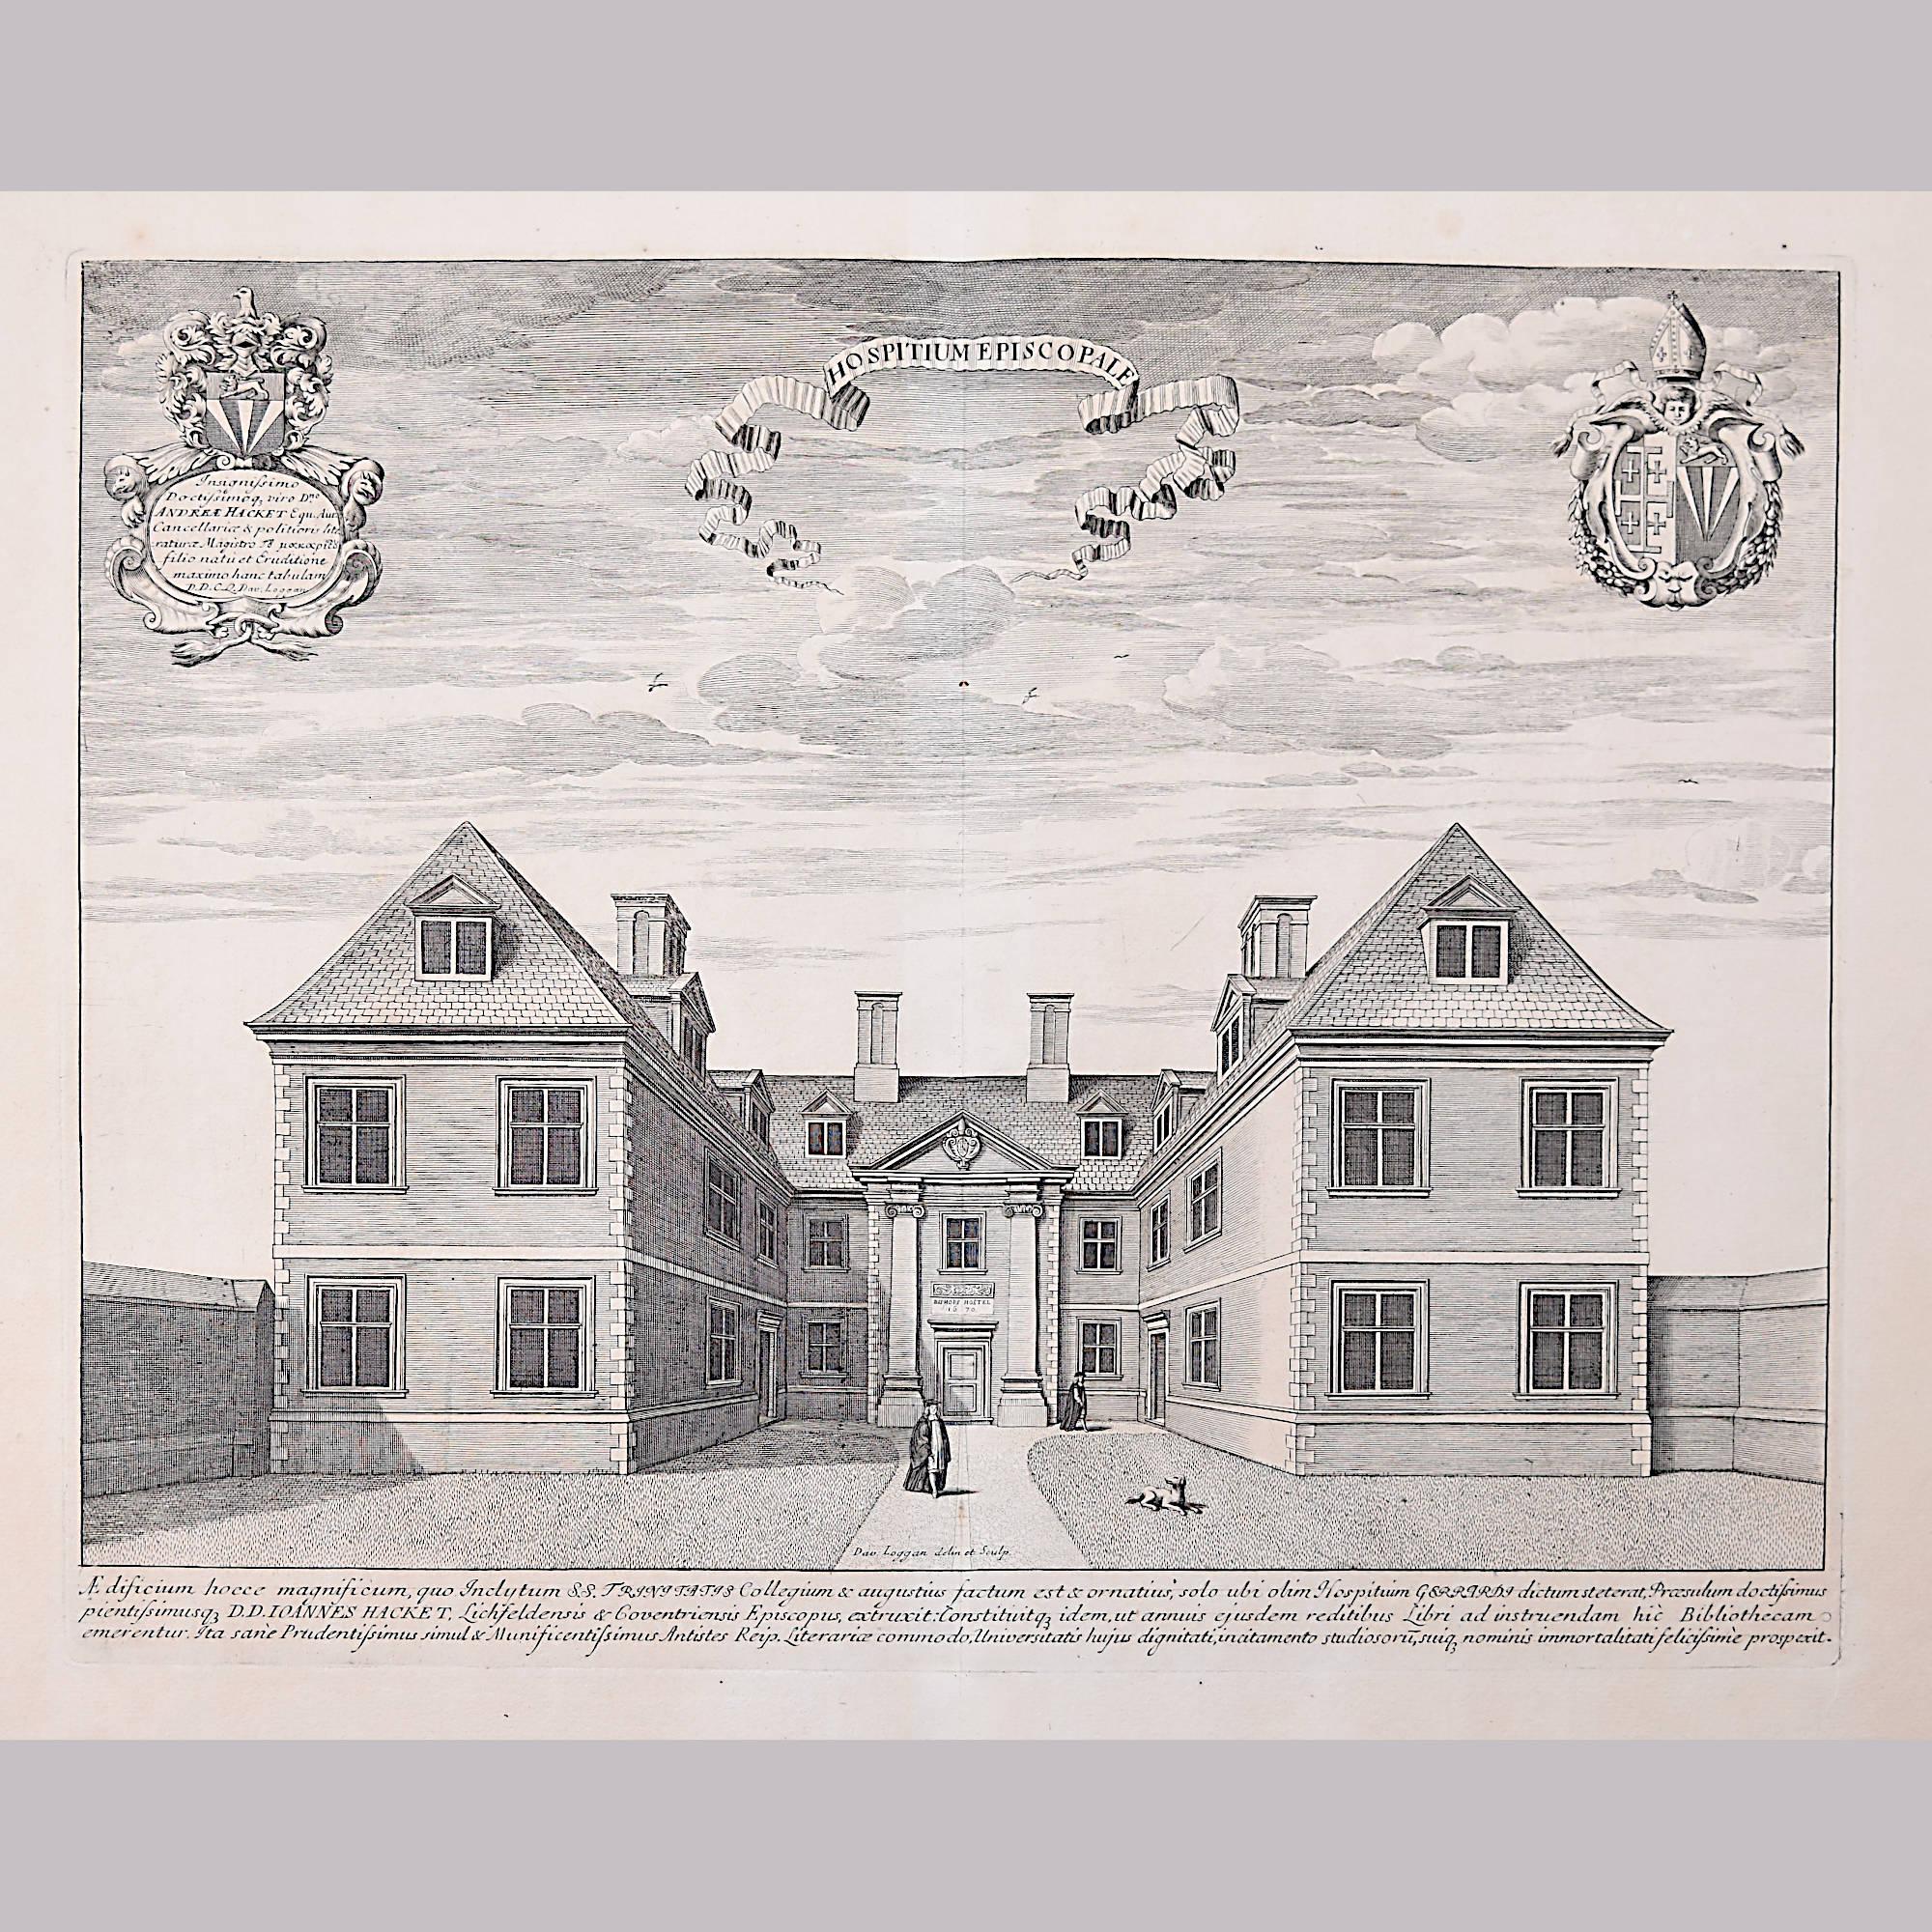 David Loggan Trinity College Cambridge Bishop's Hostel engraving 1690